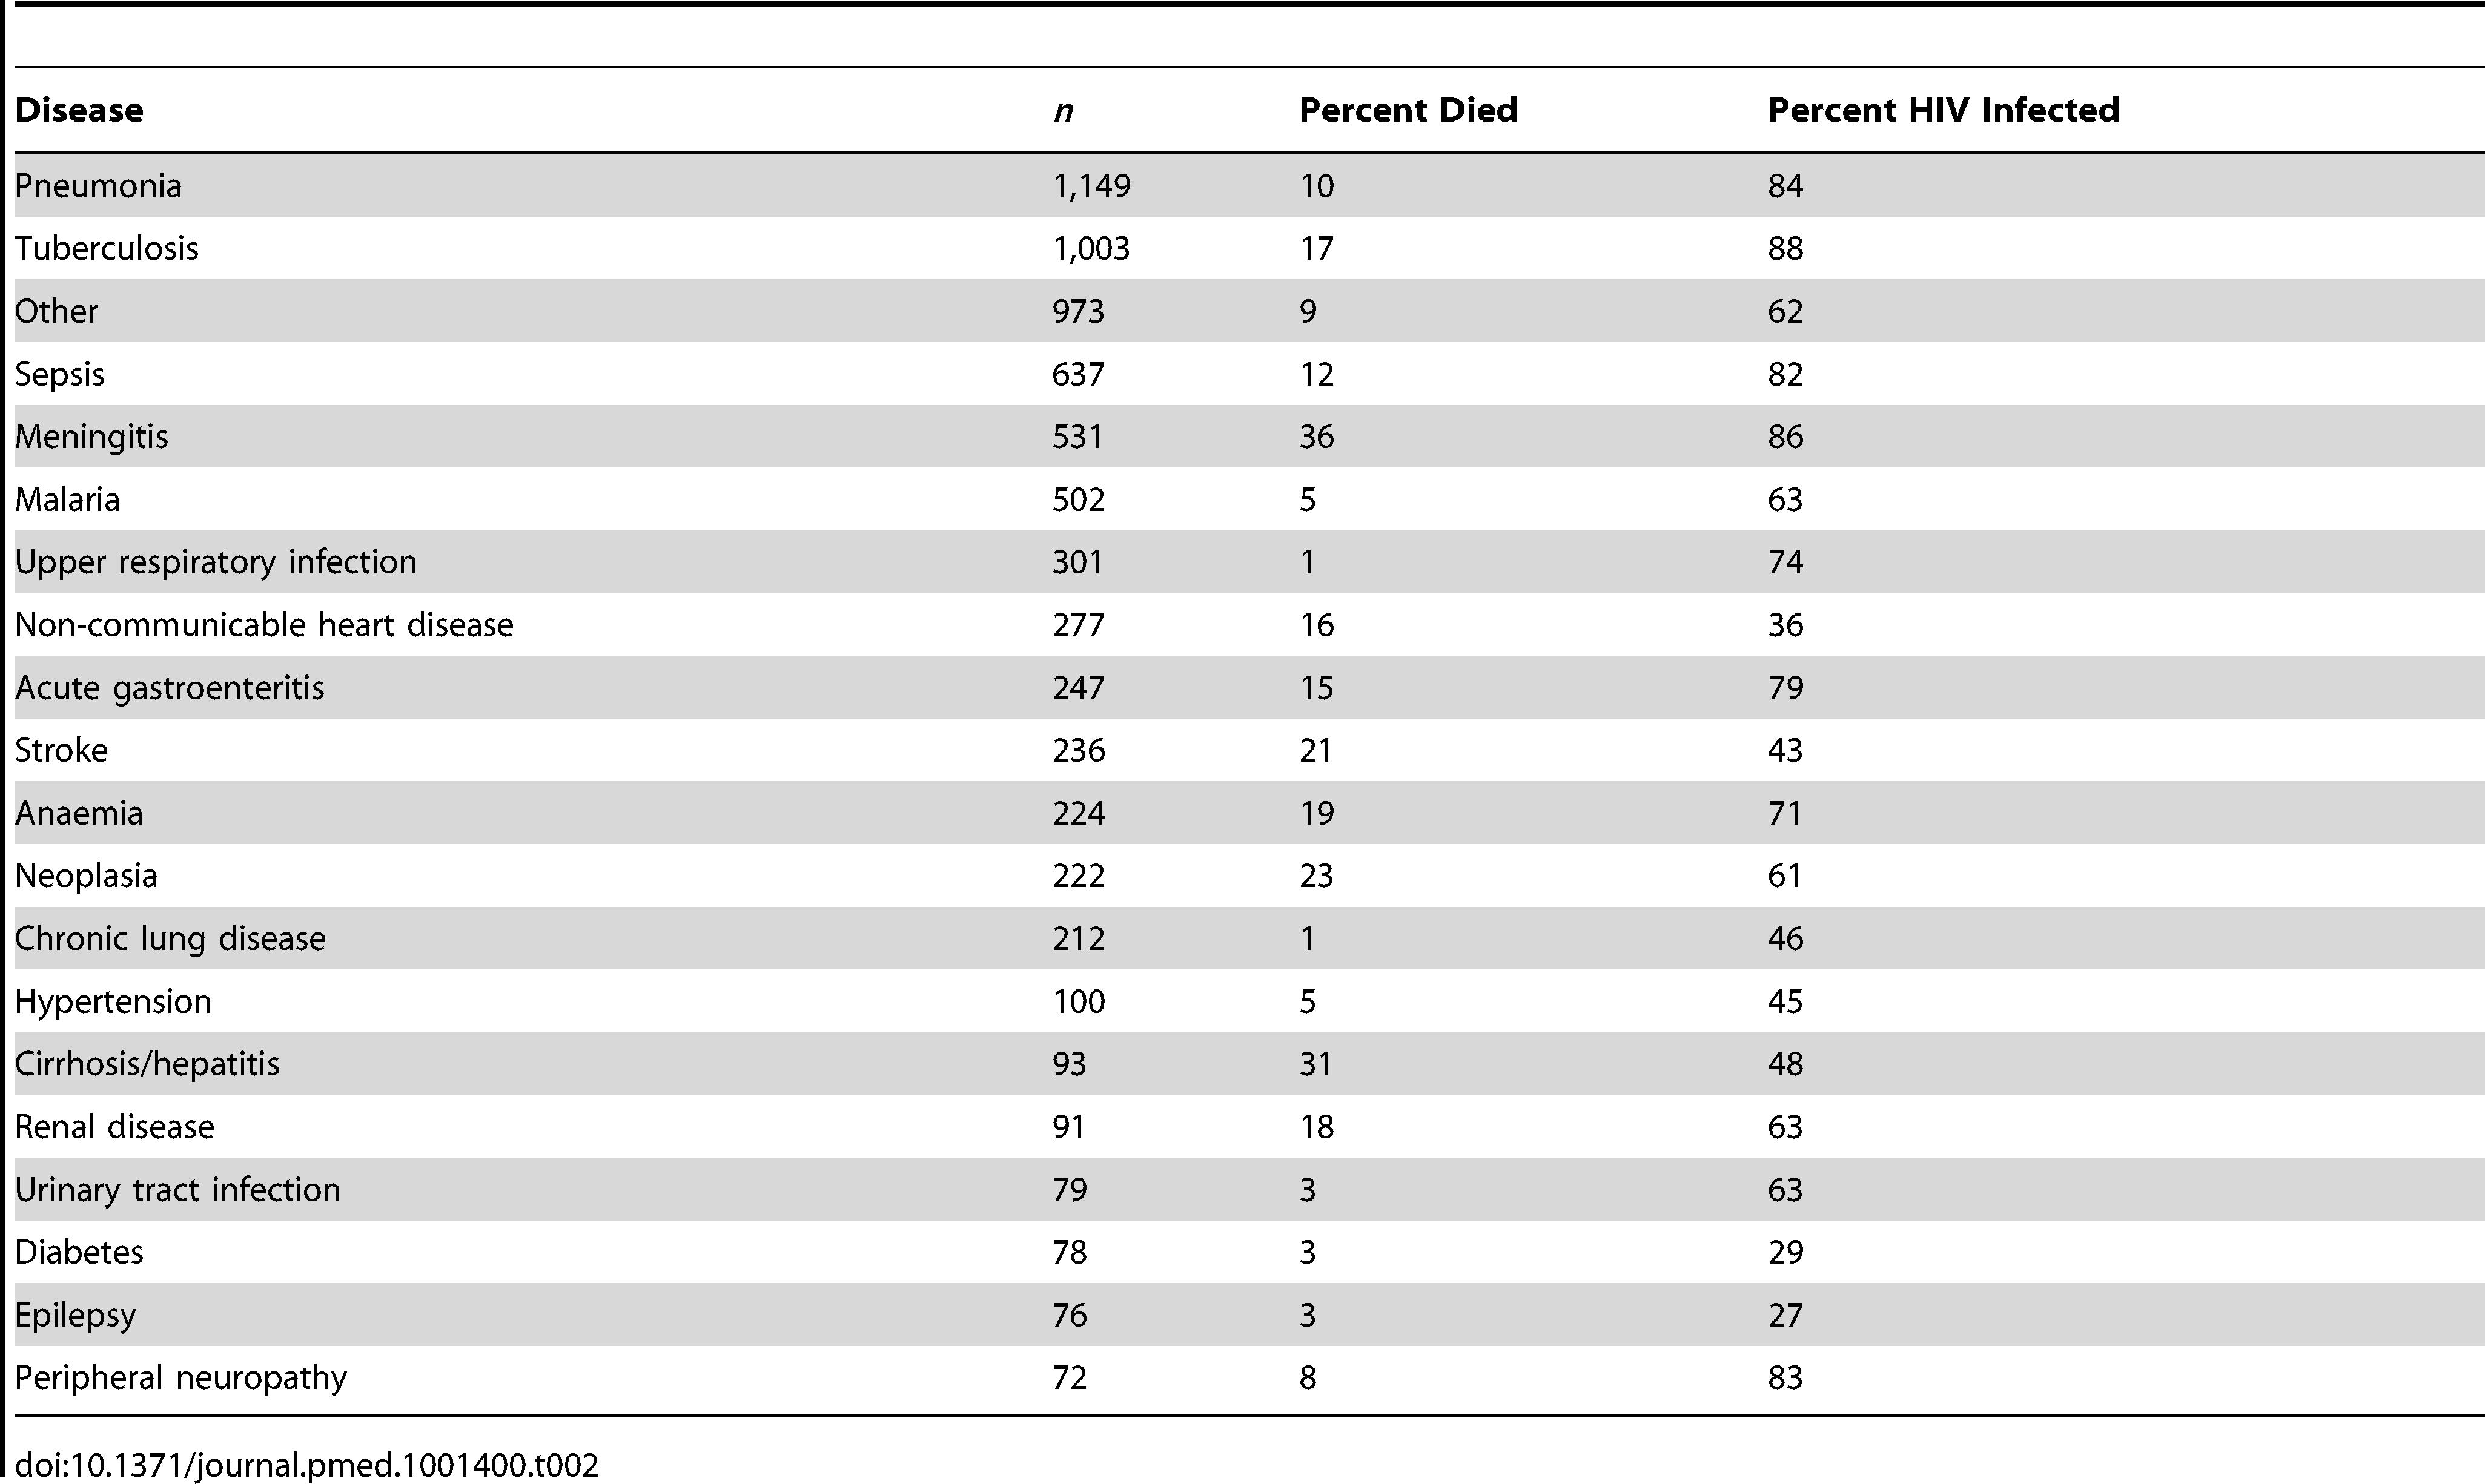 Morbidity, mortality, and HIV prevalence.